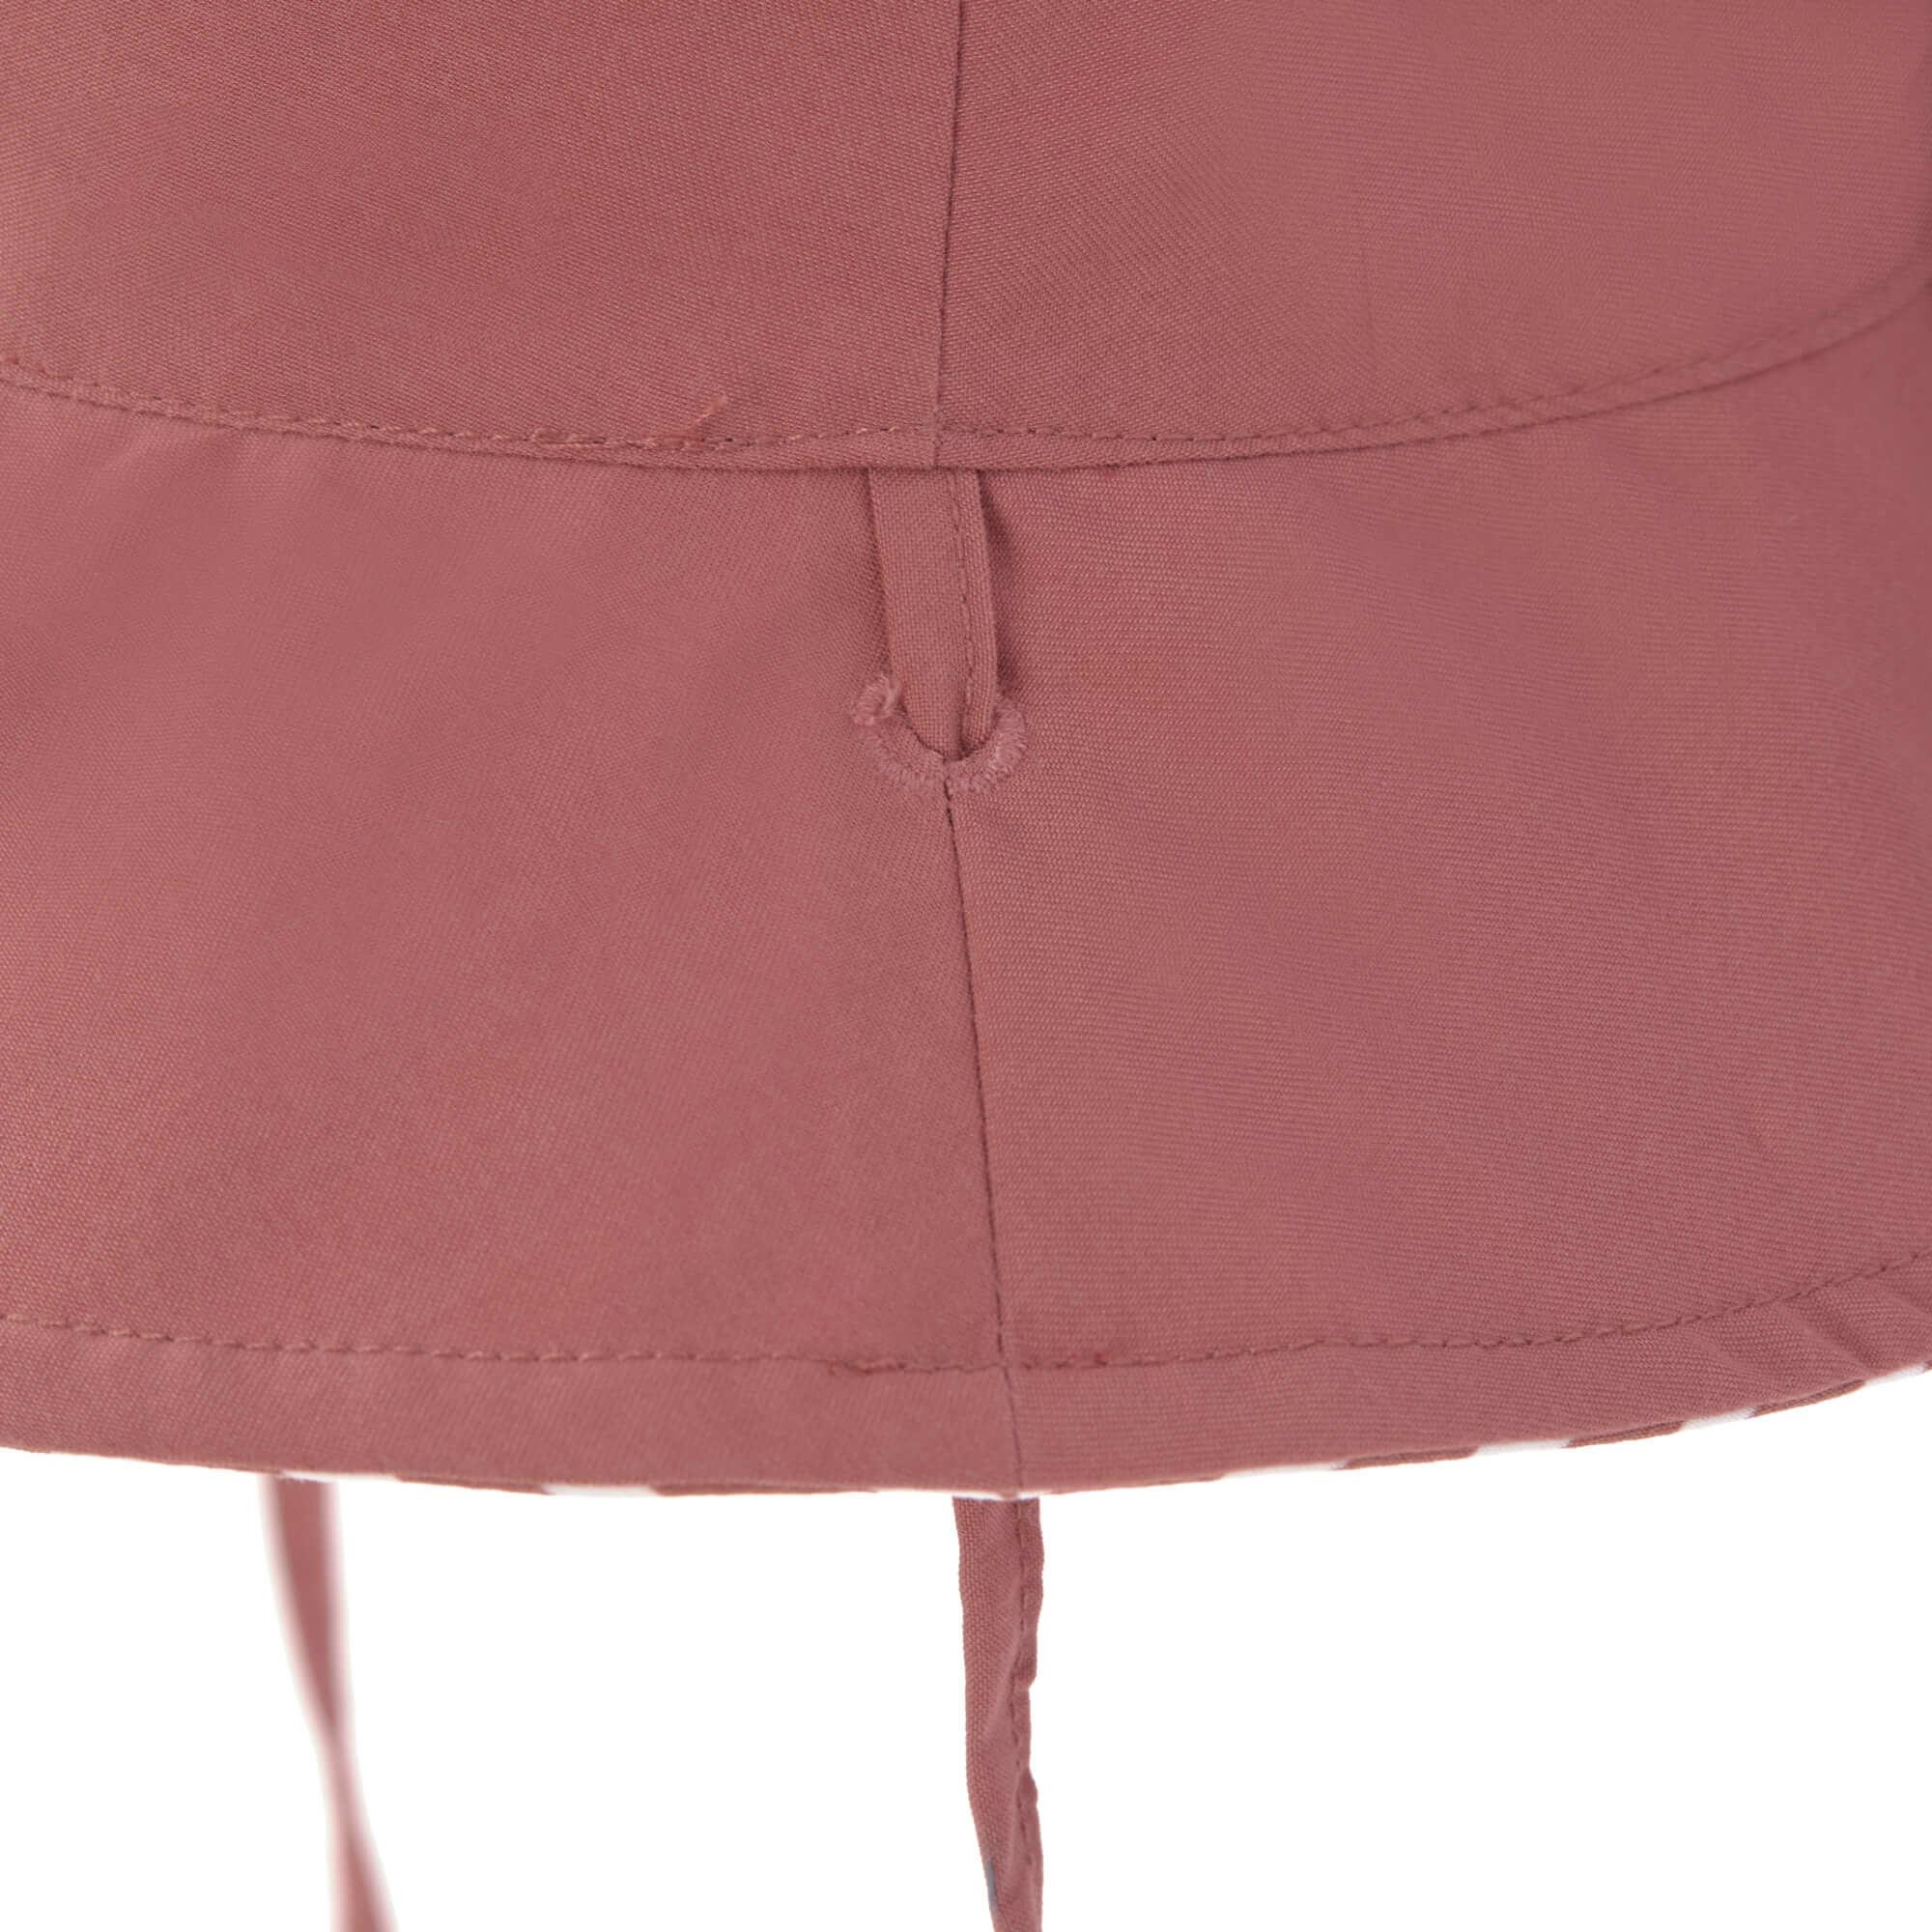 Lässig Lässig Splash & Fun Sun Protection Zonnehoed Vissershoed met UV bescherming - Stripes red 19-36 maanden, Maat: 50/51